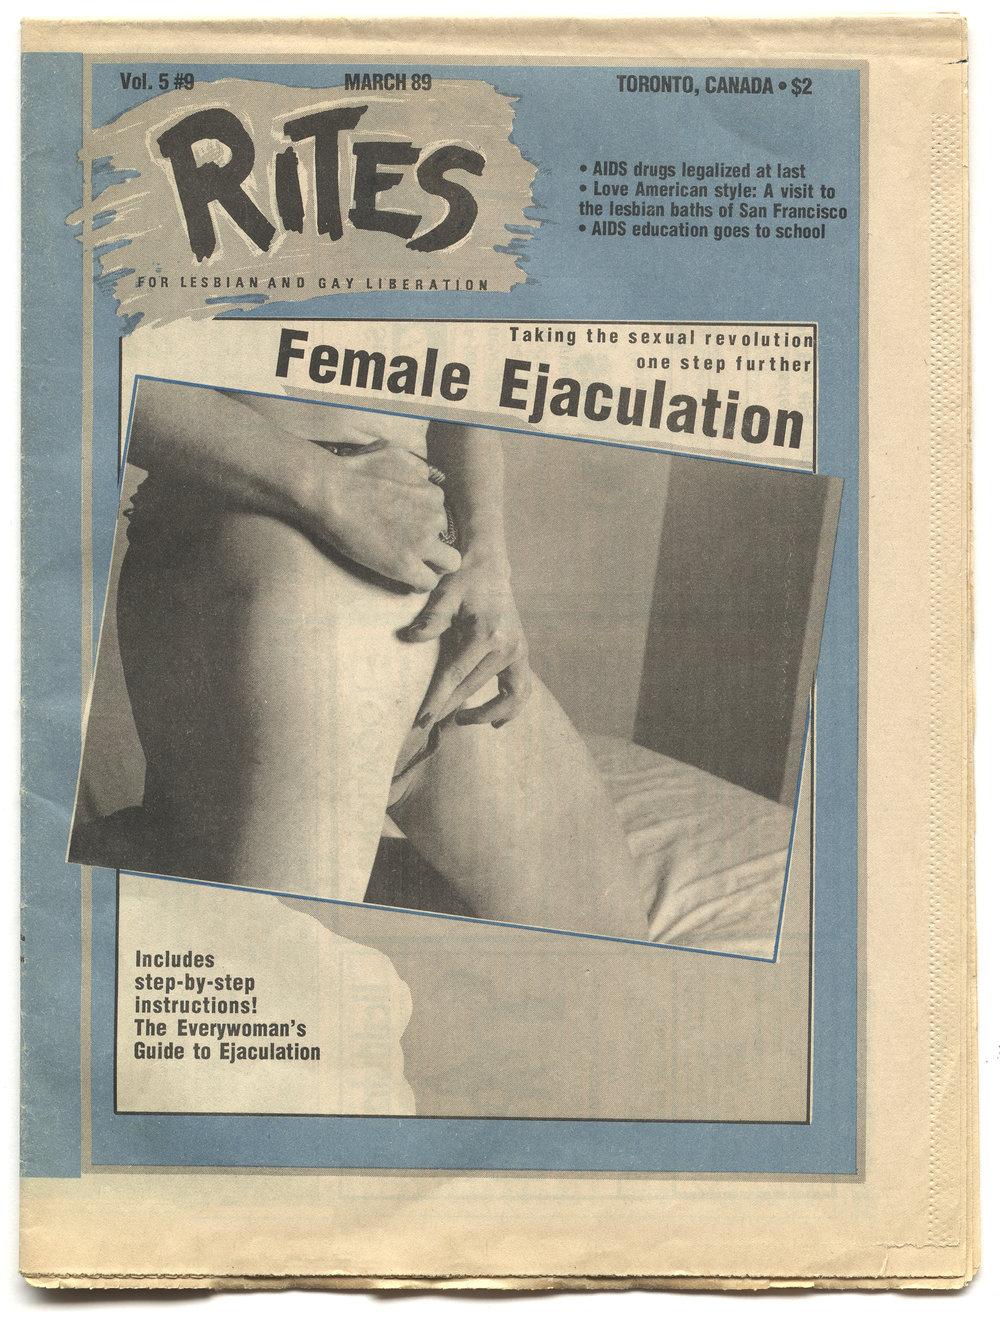 Image 4. Rites 1989 Cover copy.jpg